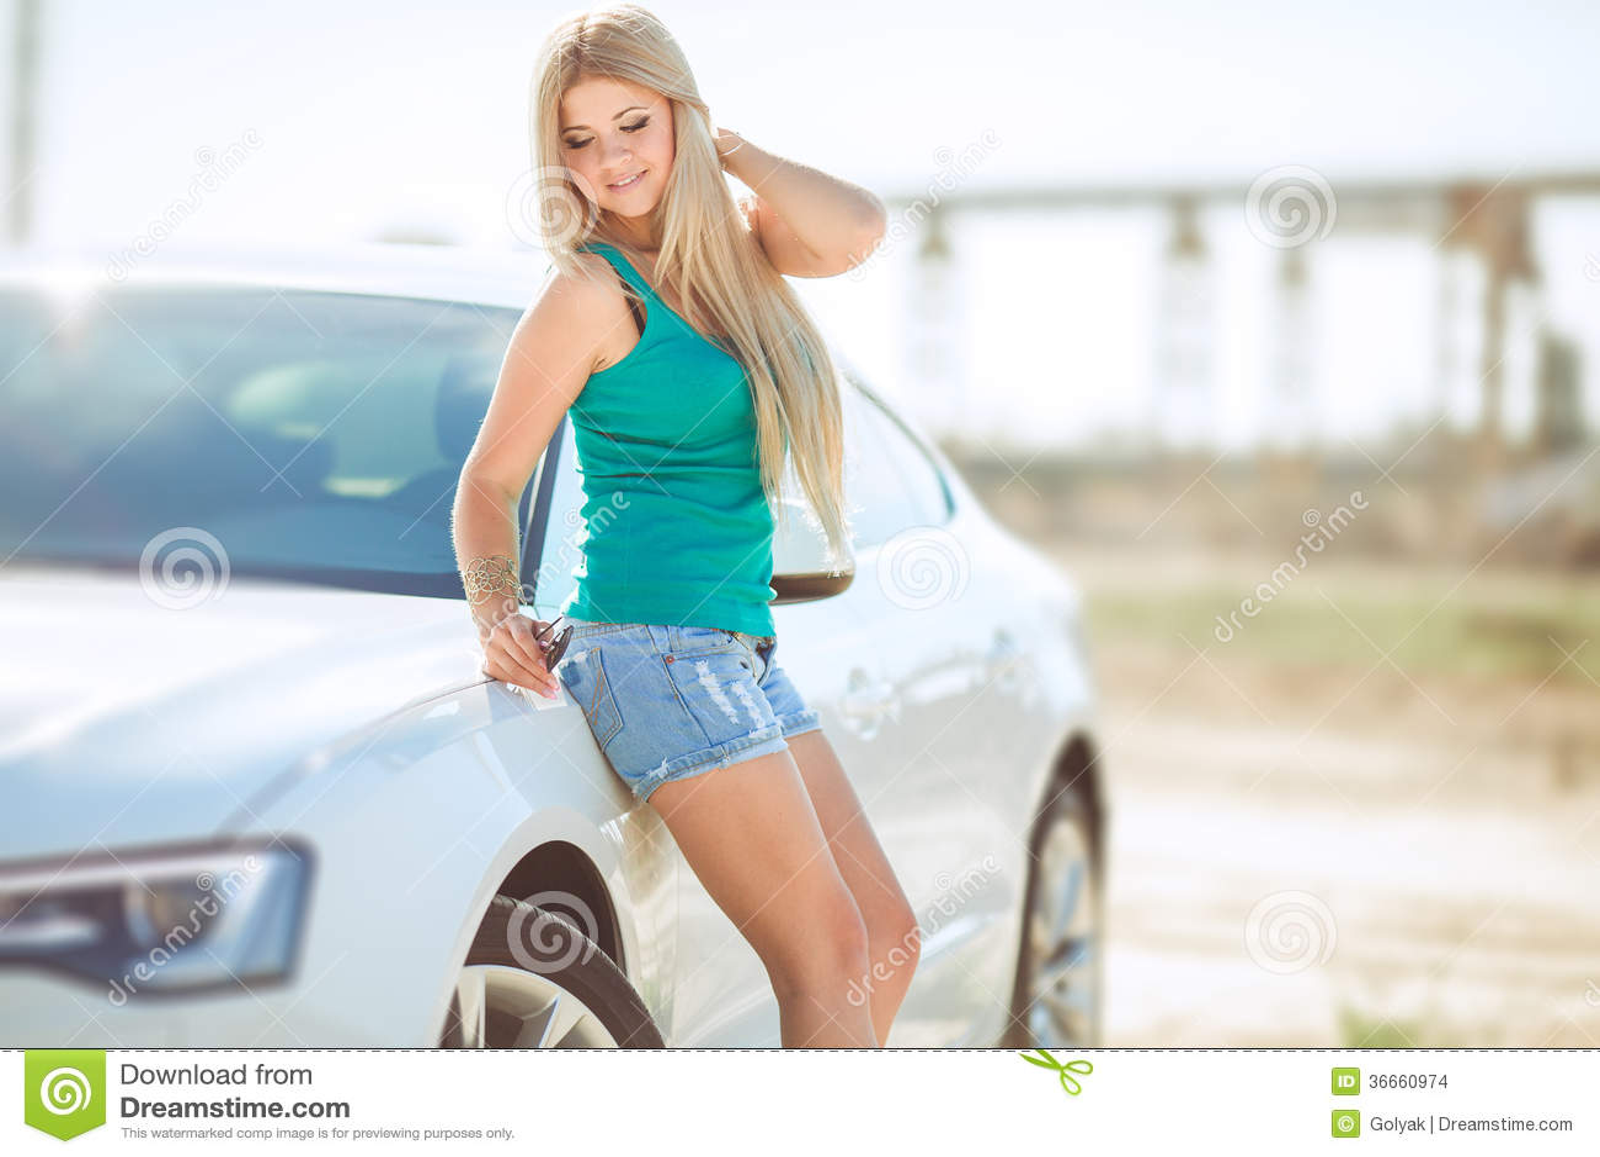 Mississaug Winnipeg Car Fun Escort Girls